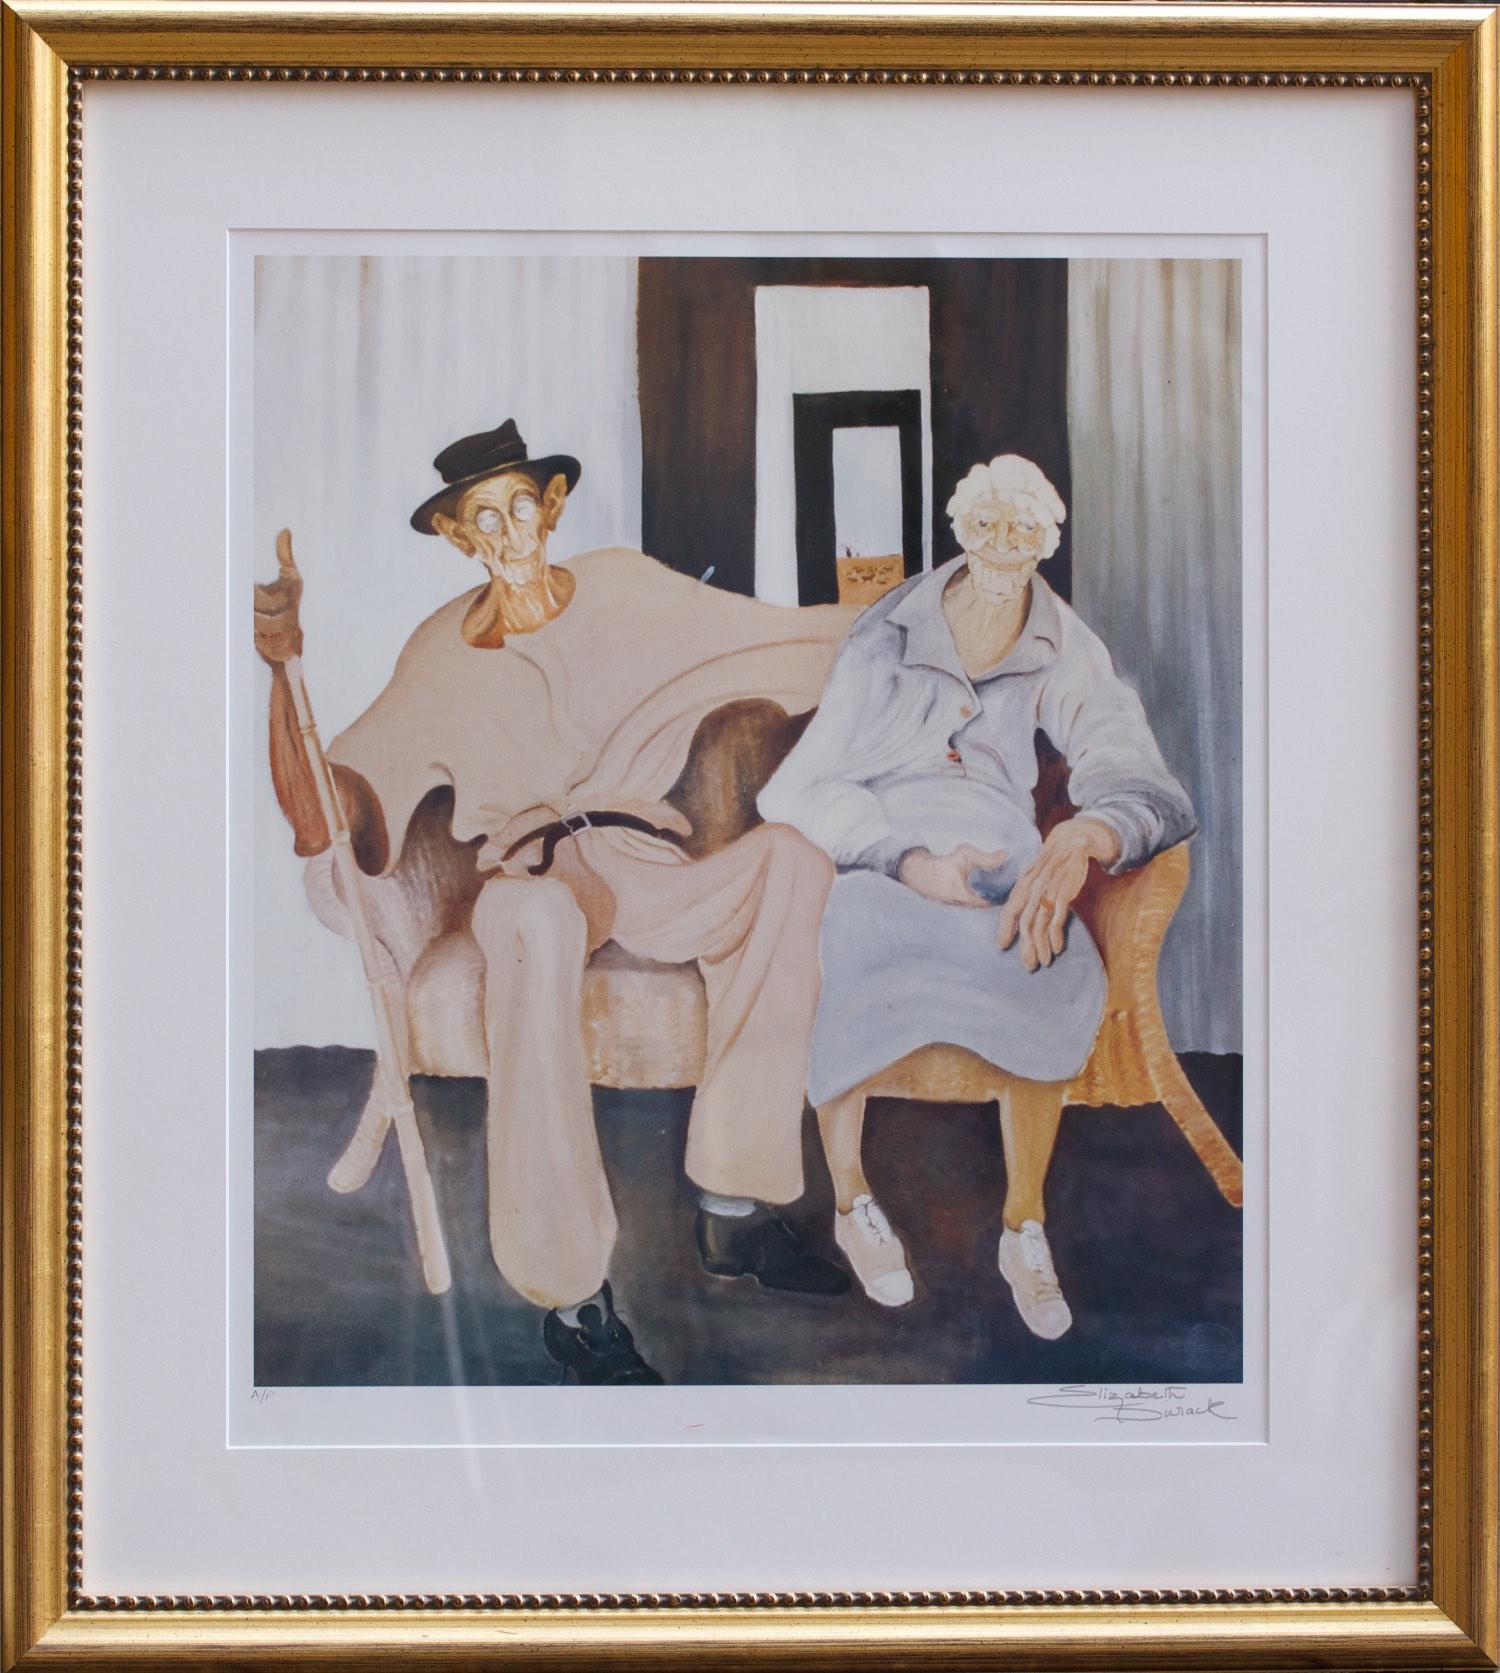 Elizabeth Durack Golden Wedding P/P  59cm x 48cm (89cm x 80cm Framed) Hand signed by artist - Limited Edition, Printers Proof